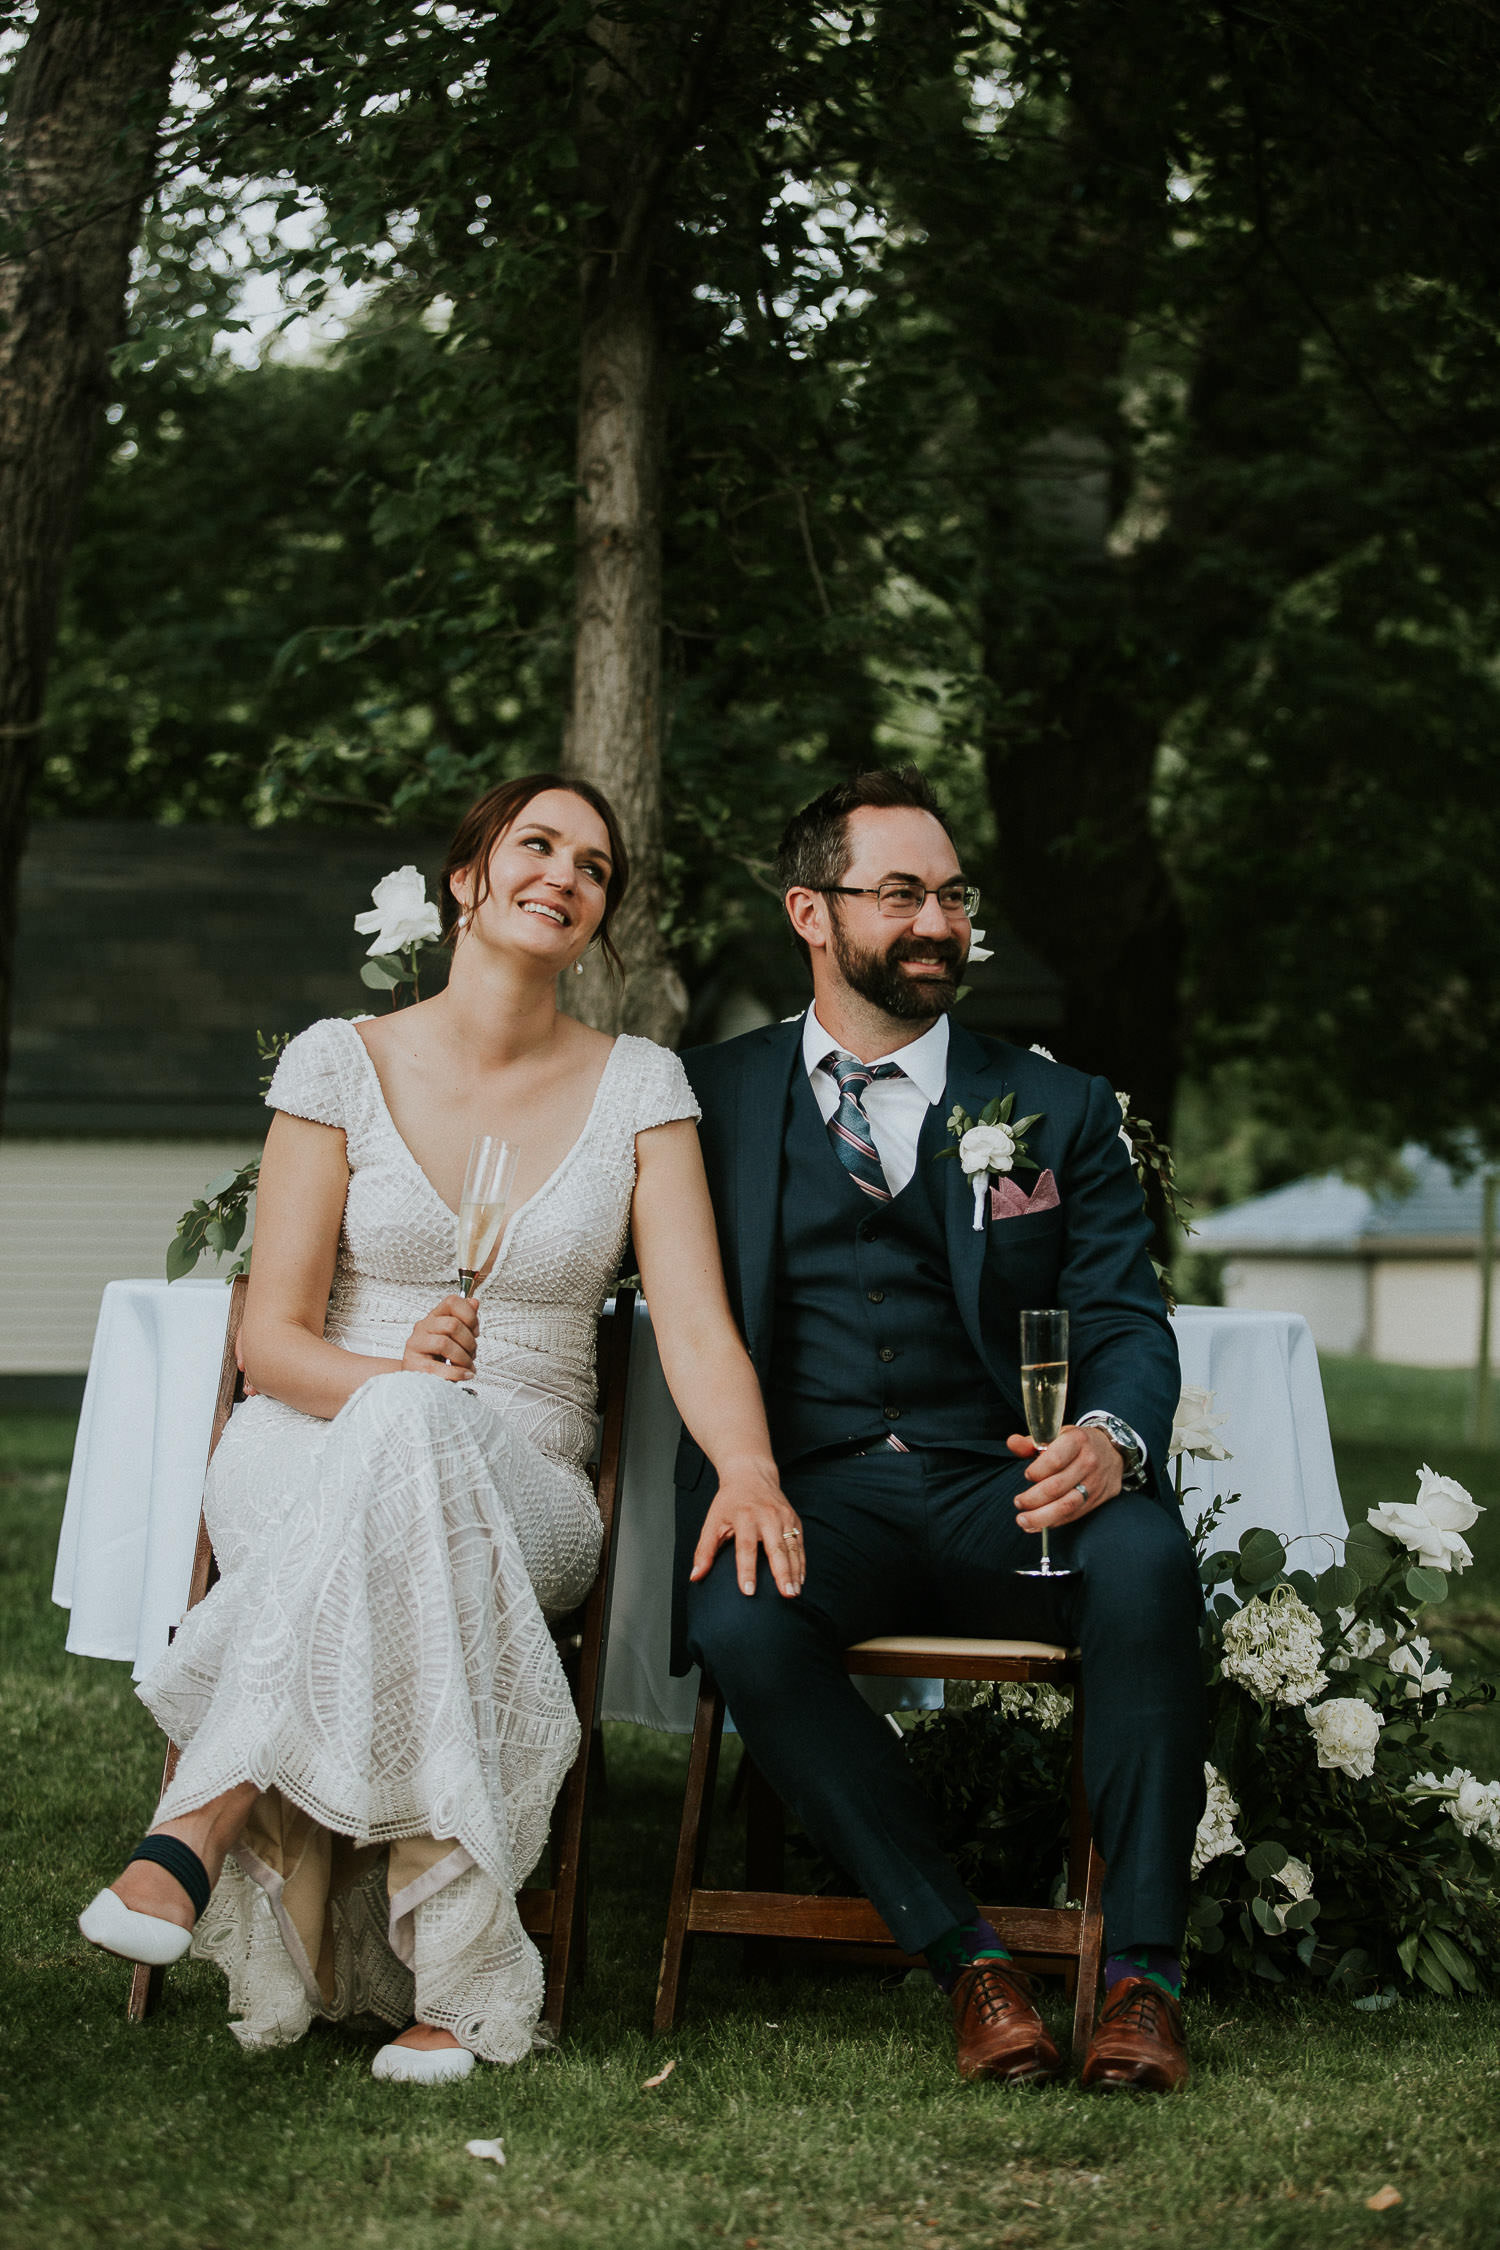 summer-backyard-wedding-in-alberta-sarah-pukin-0151